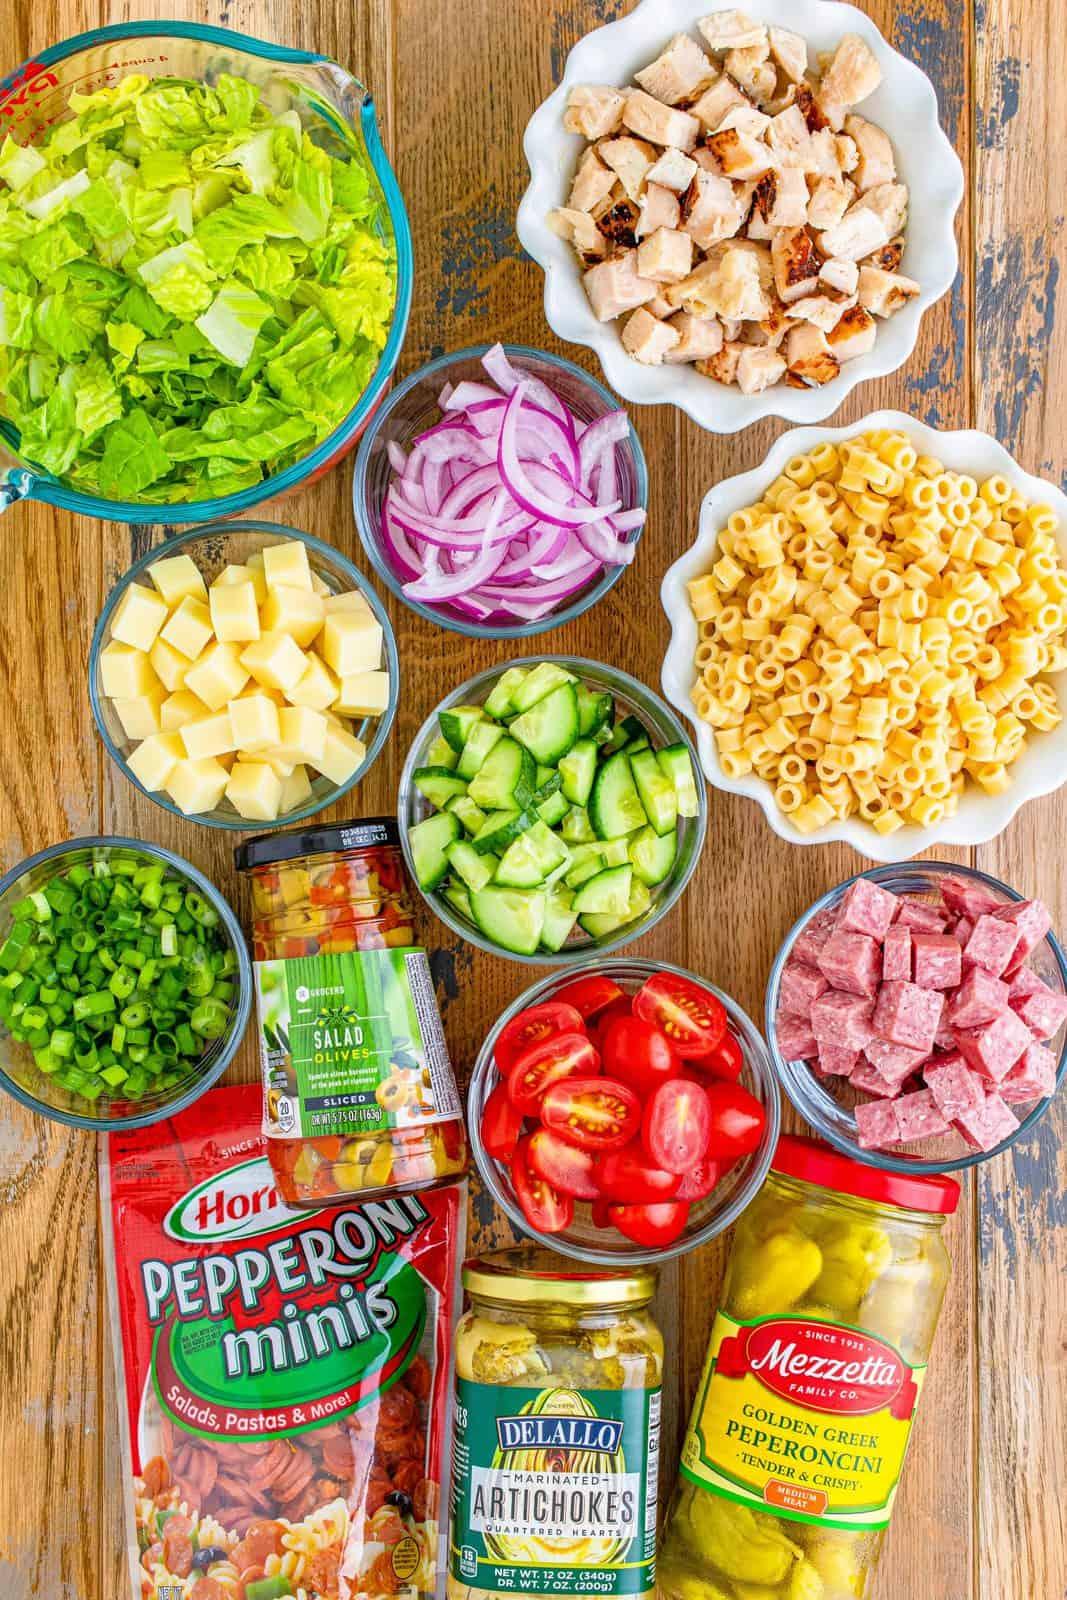 salad ingredients needed: ditalini pasta, romaine lettuce, grape tomatoes, salami, mozzarella, cucumber, green onions, artichoke hearts, grilled chicken breast strips and mini pepperoni.